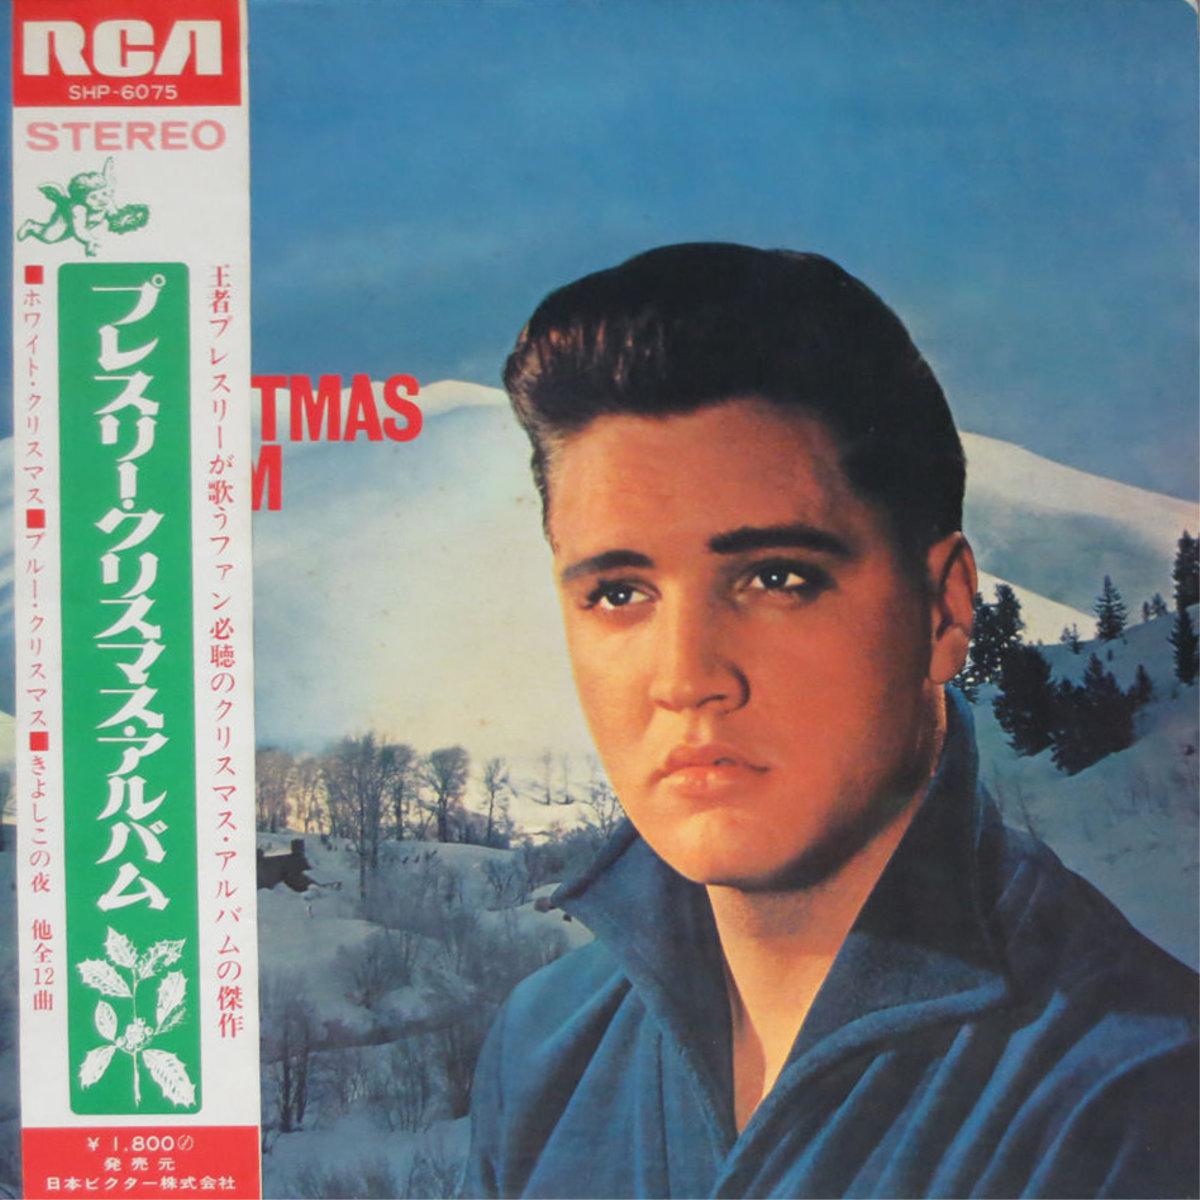 Diskografie Japan 1955 - 1977 Shp-6075s4s1h